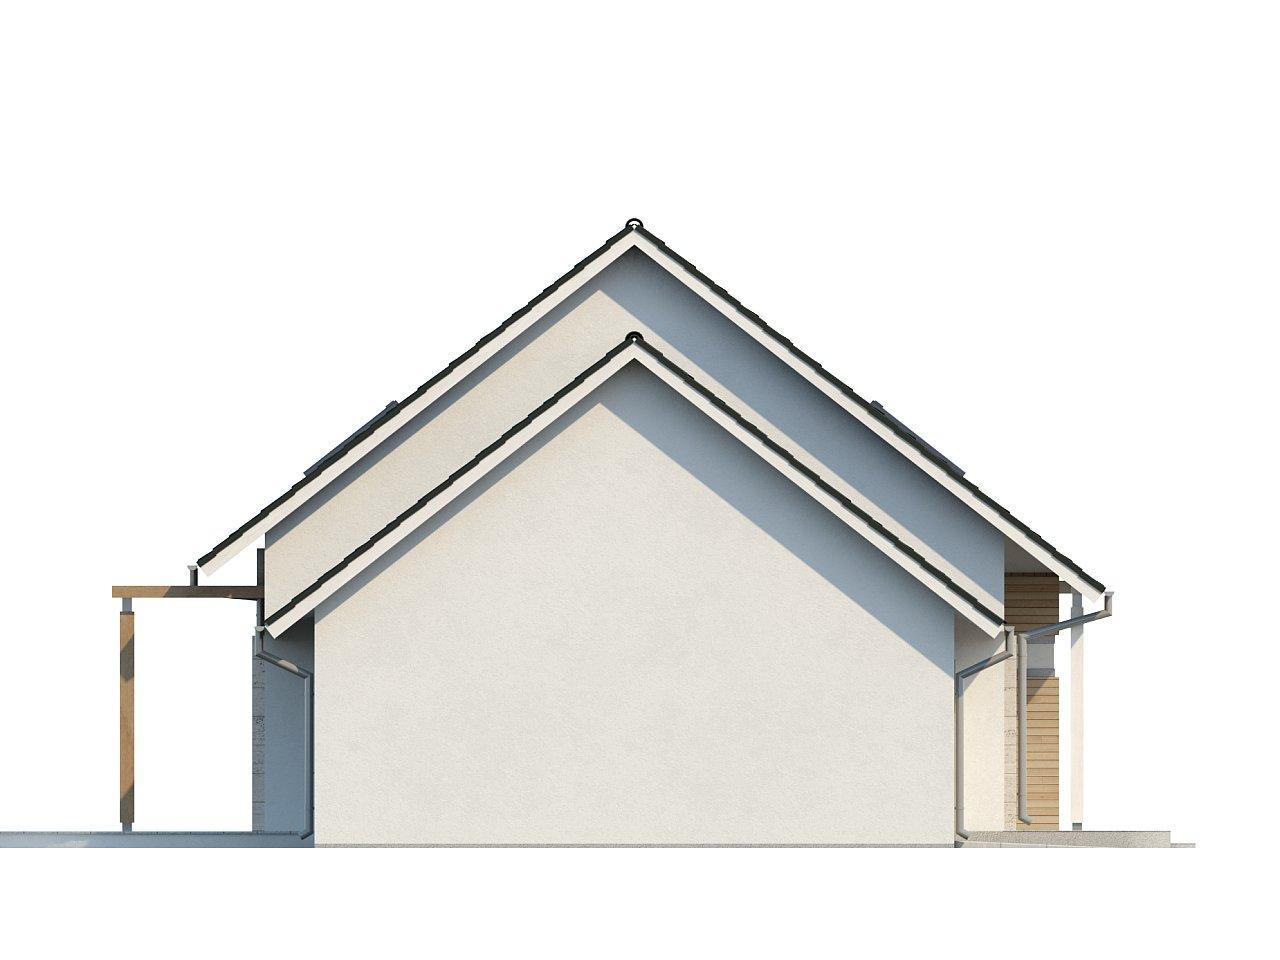 Проект практичного дома с эркером и гаражом на одну машину. 25